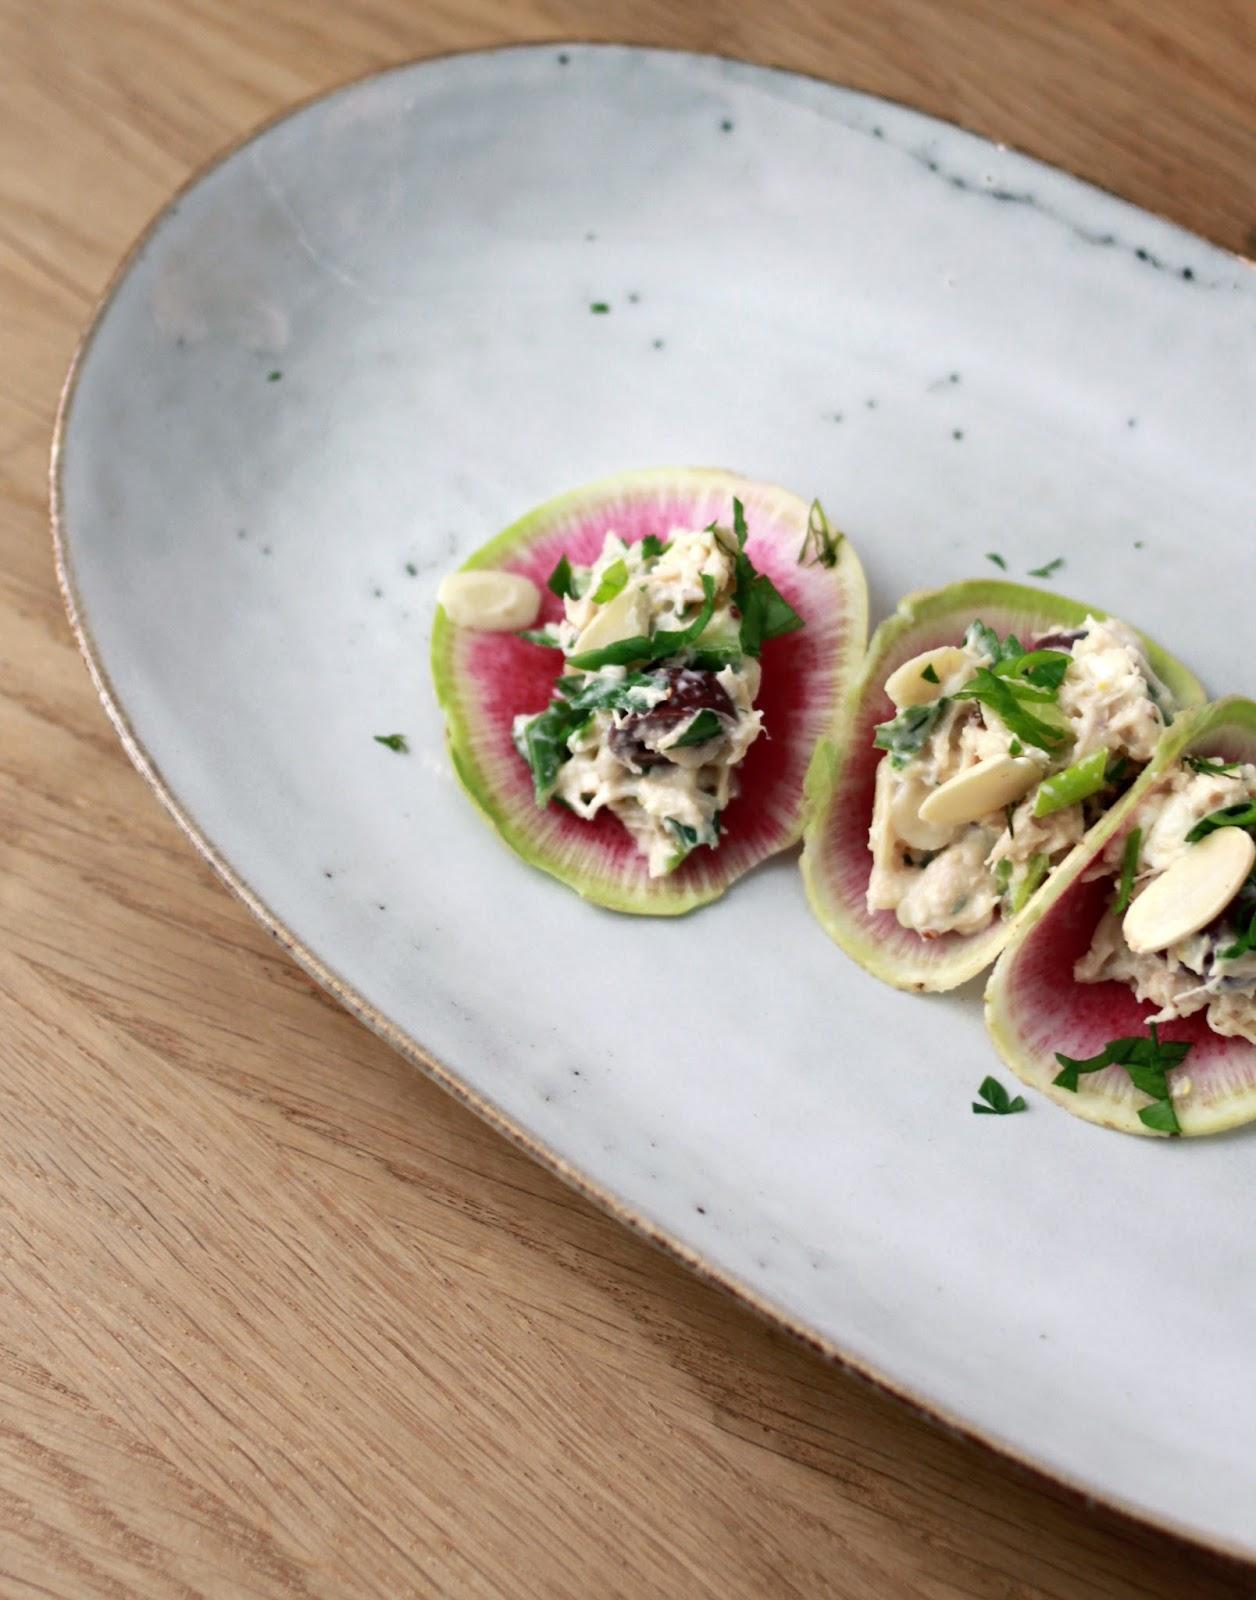 Mini radish tacos with chicken dill salad